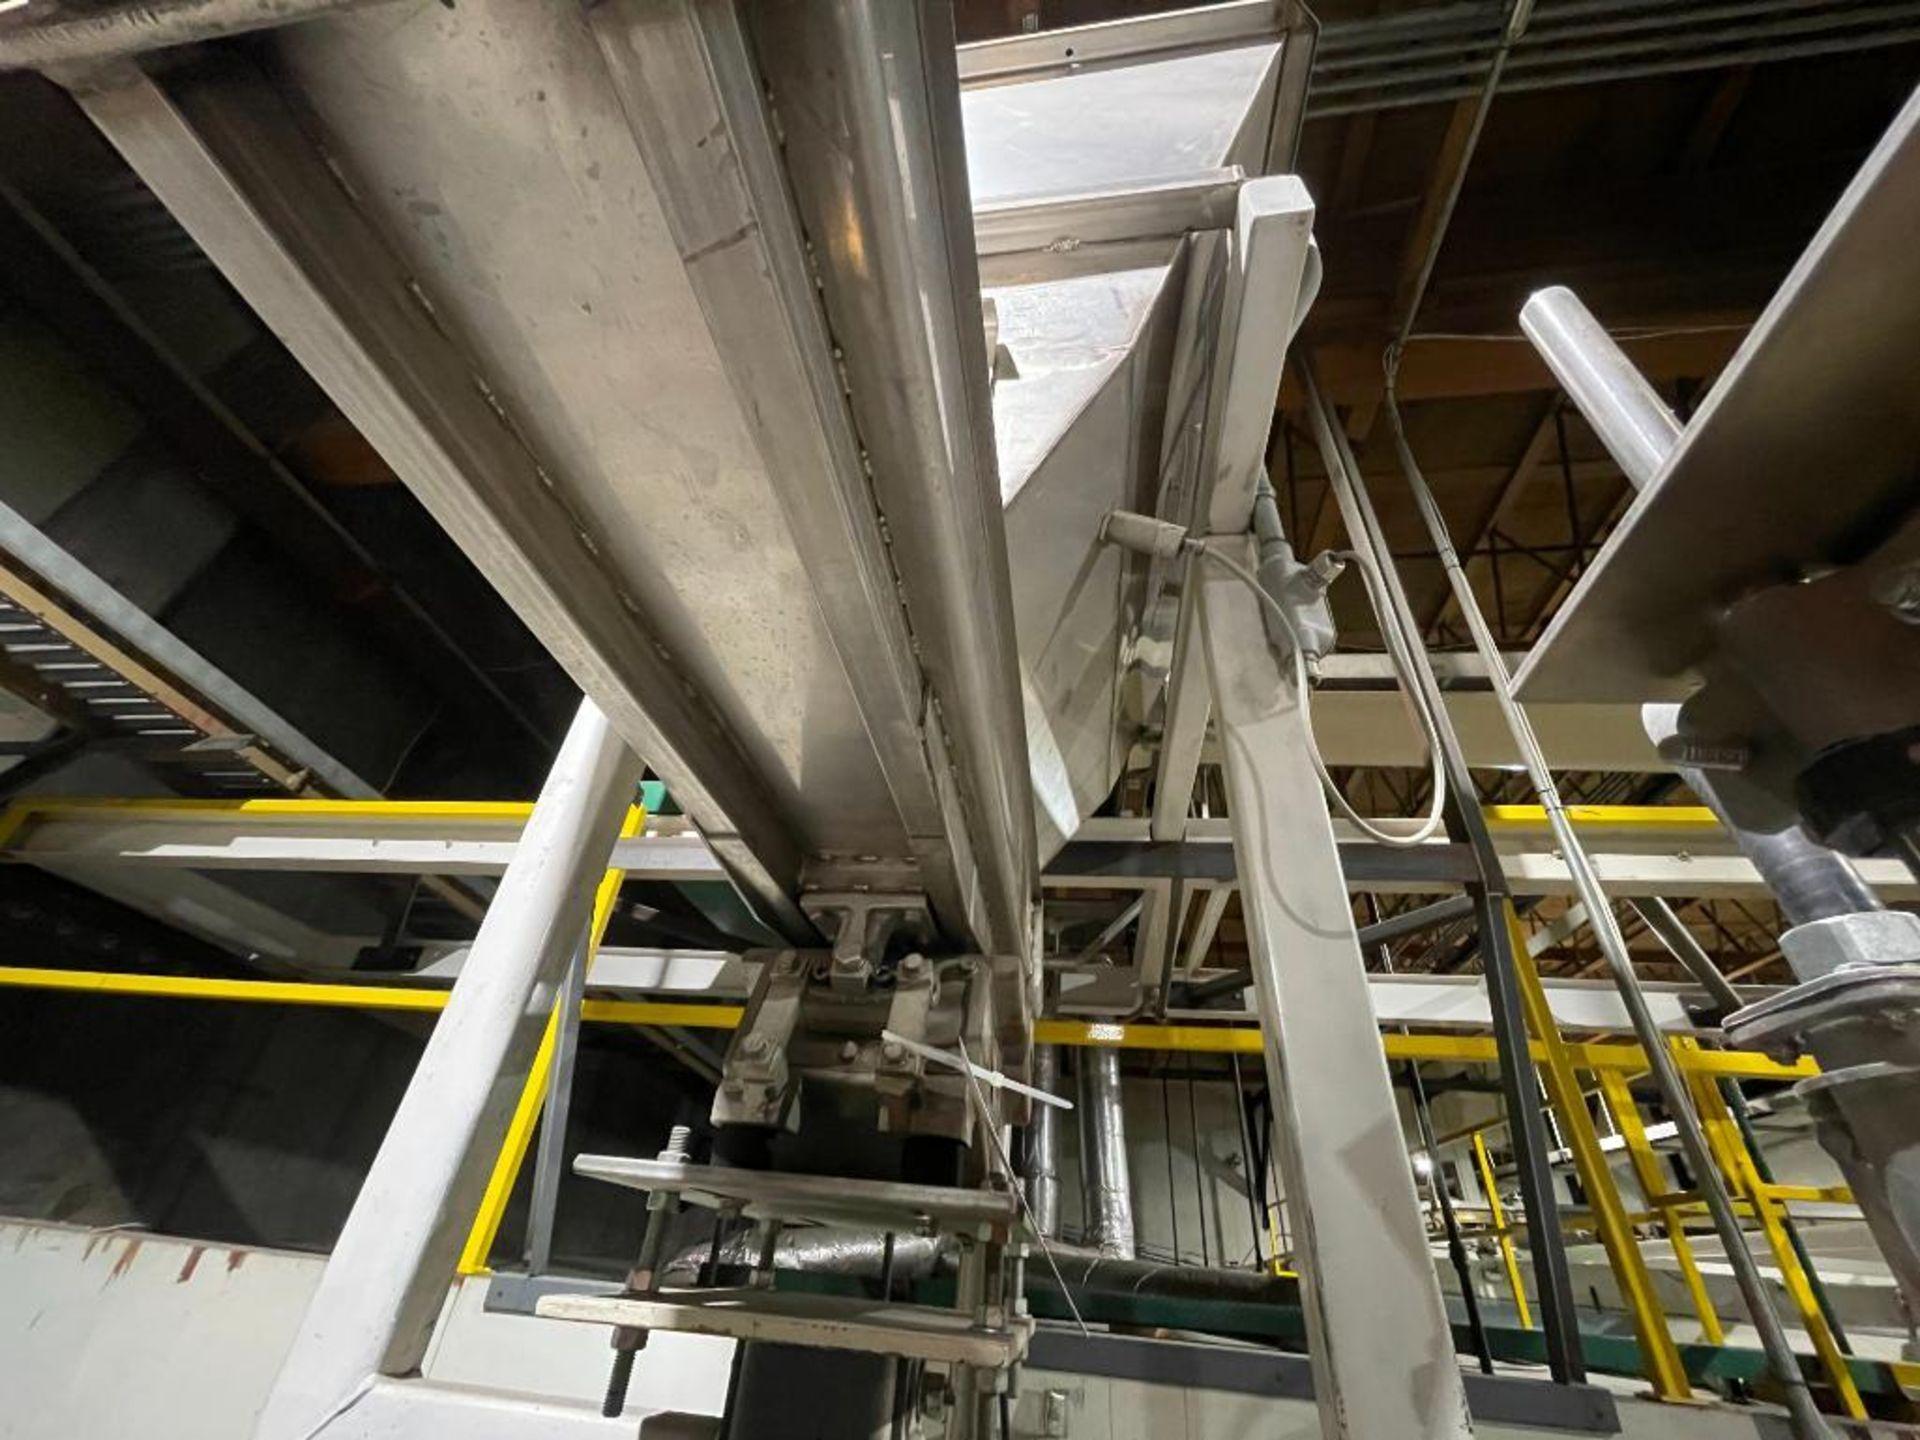 Eriez vibratory conveyor - Image 10 of 12